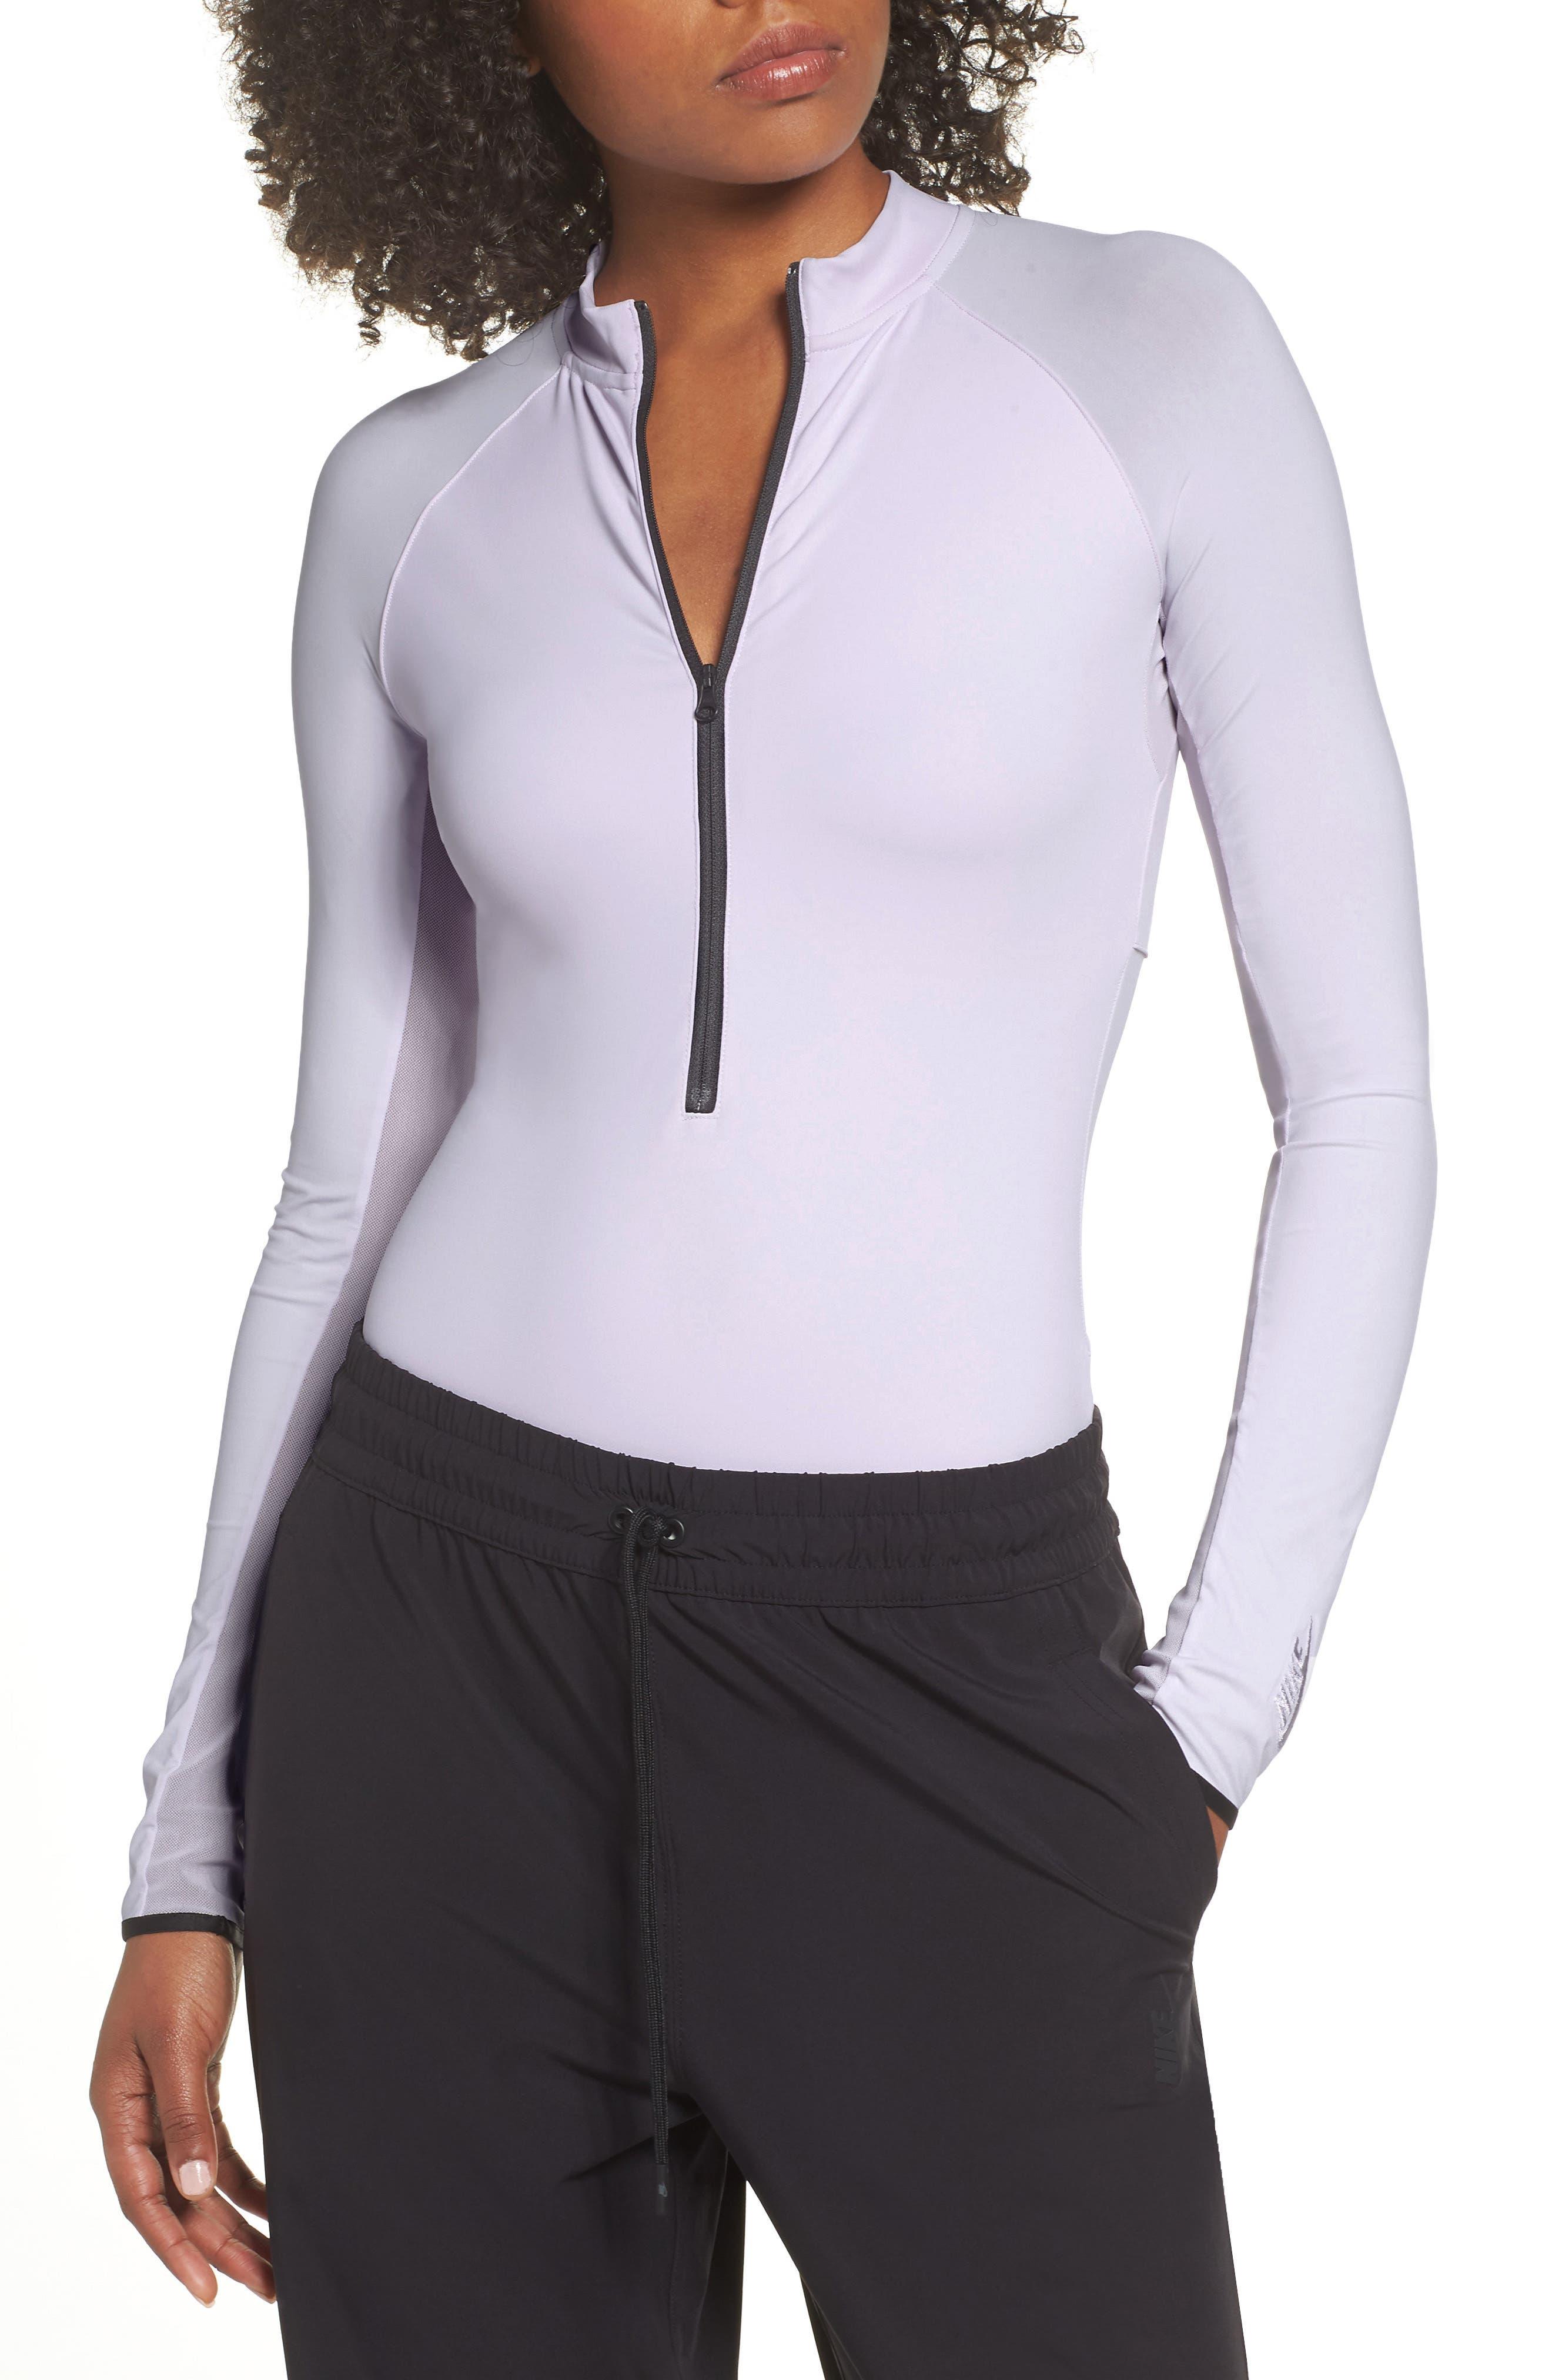 NRG Women's Dri-FIT Long Sleeve Bodysuit,                             Alternate thumbnail 2, color,                             BARELY GRAPE/ BARELY GRAPE